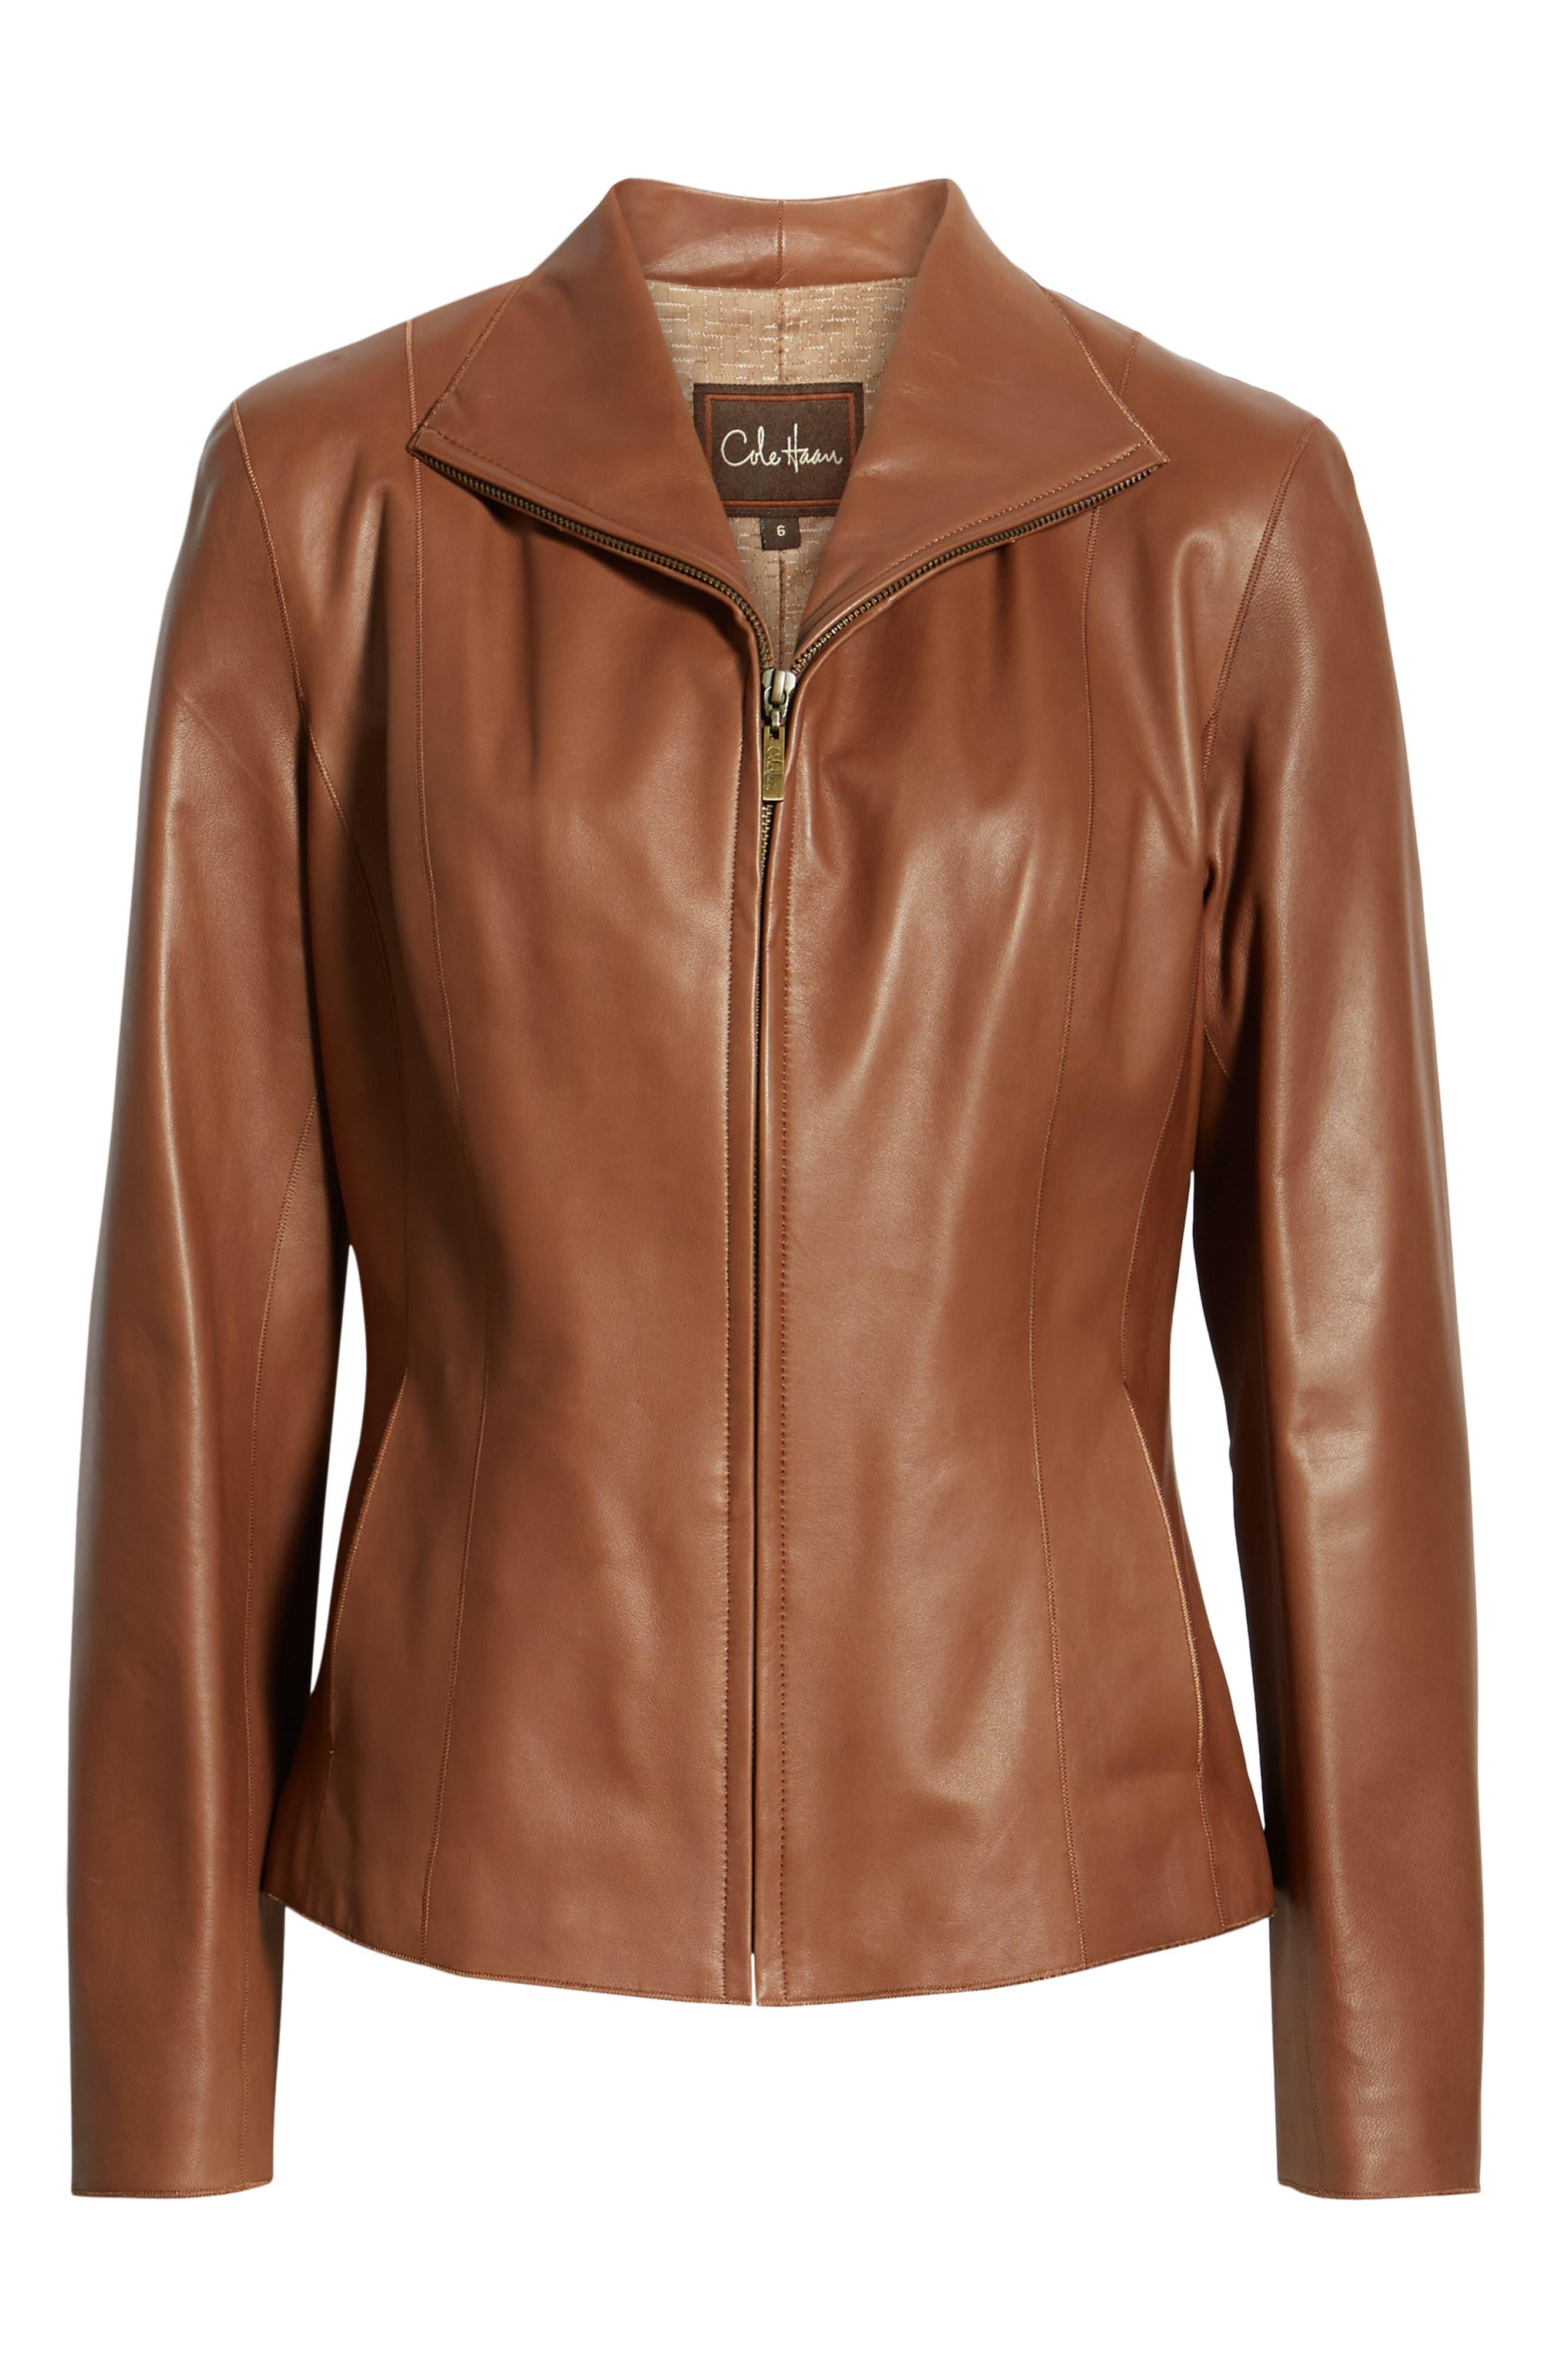 COLE HAAN,                             Lambskin Leather Scuba Jacket,                             Alternate thumbnail 6, color,                             237